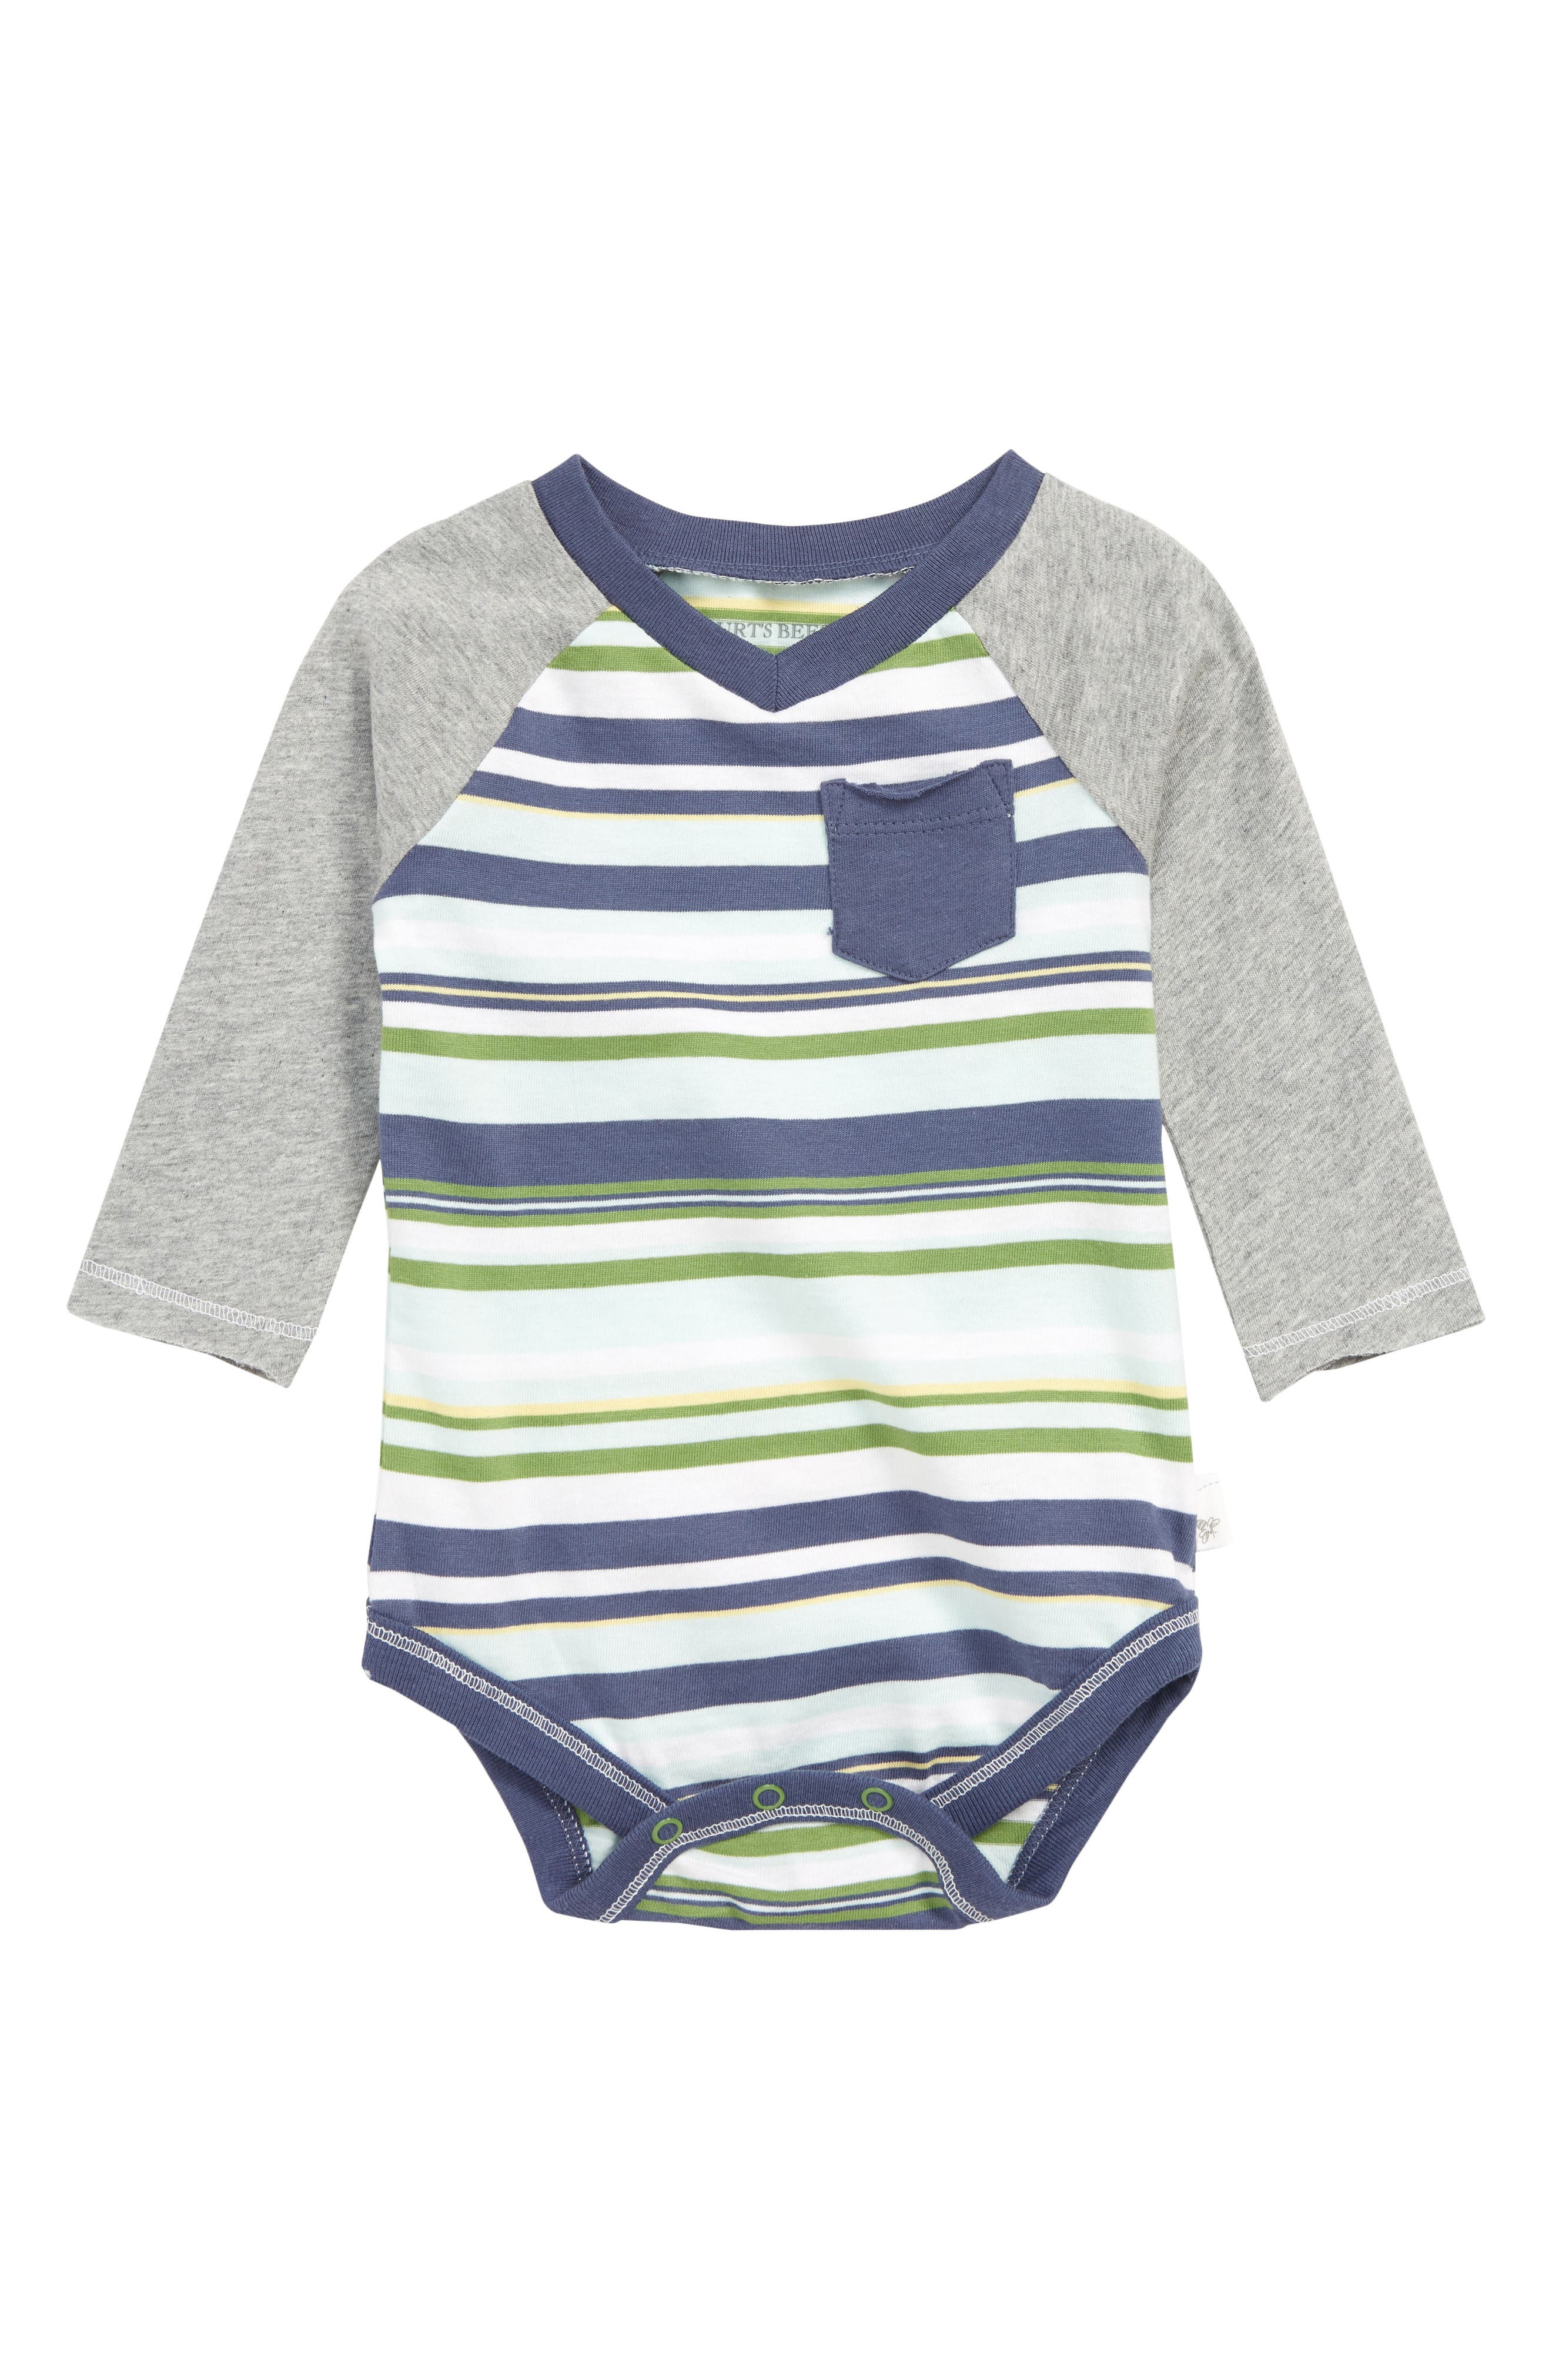 BURT'S BEES BABY, Vintage Stripe Organic Cotton Bodysuit, Main thumbnail 1, color, INDIGO